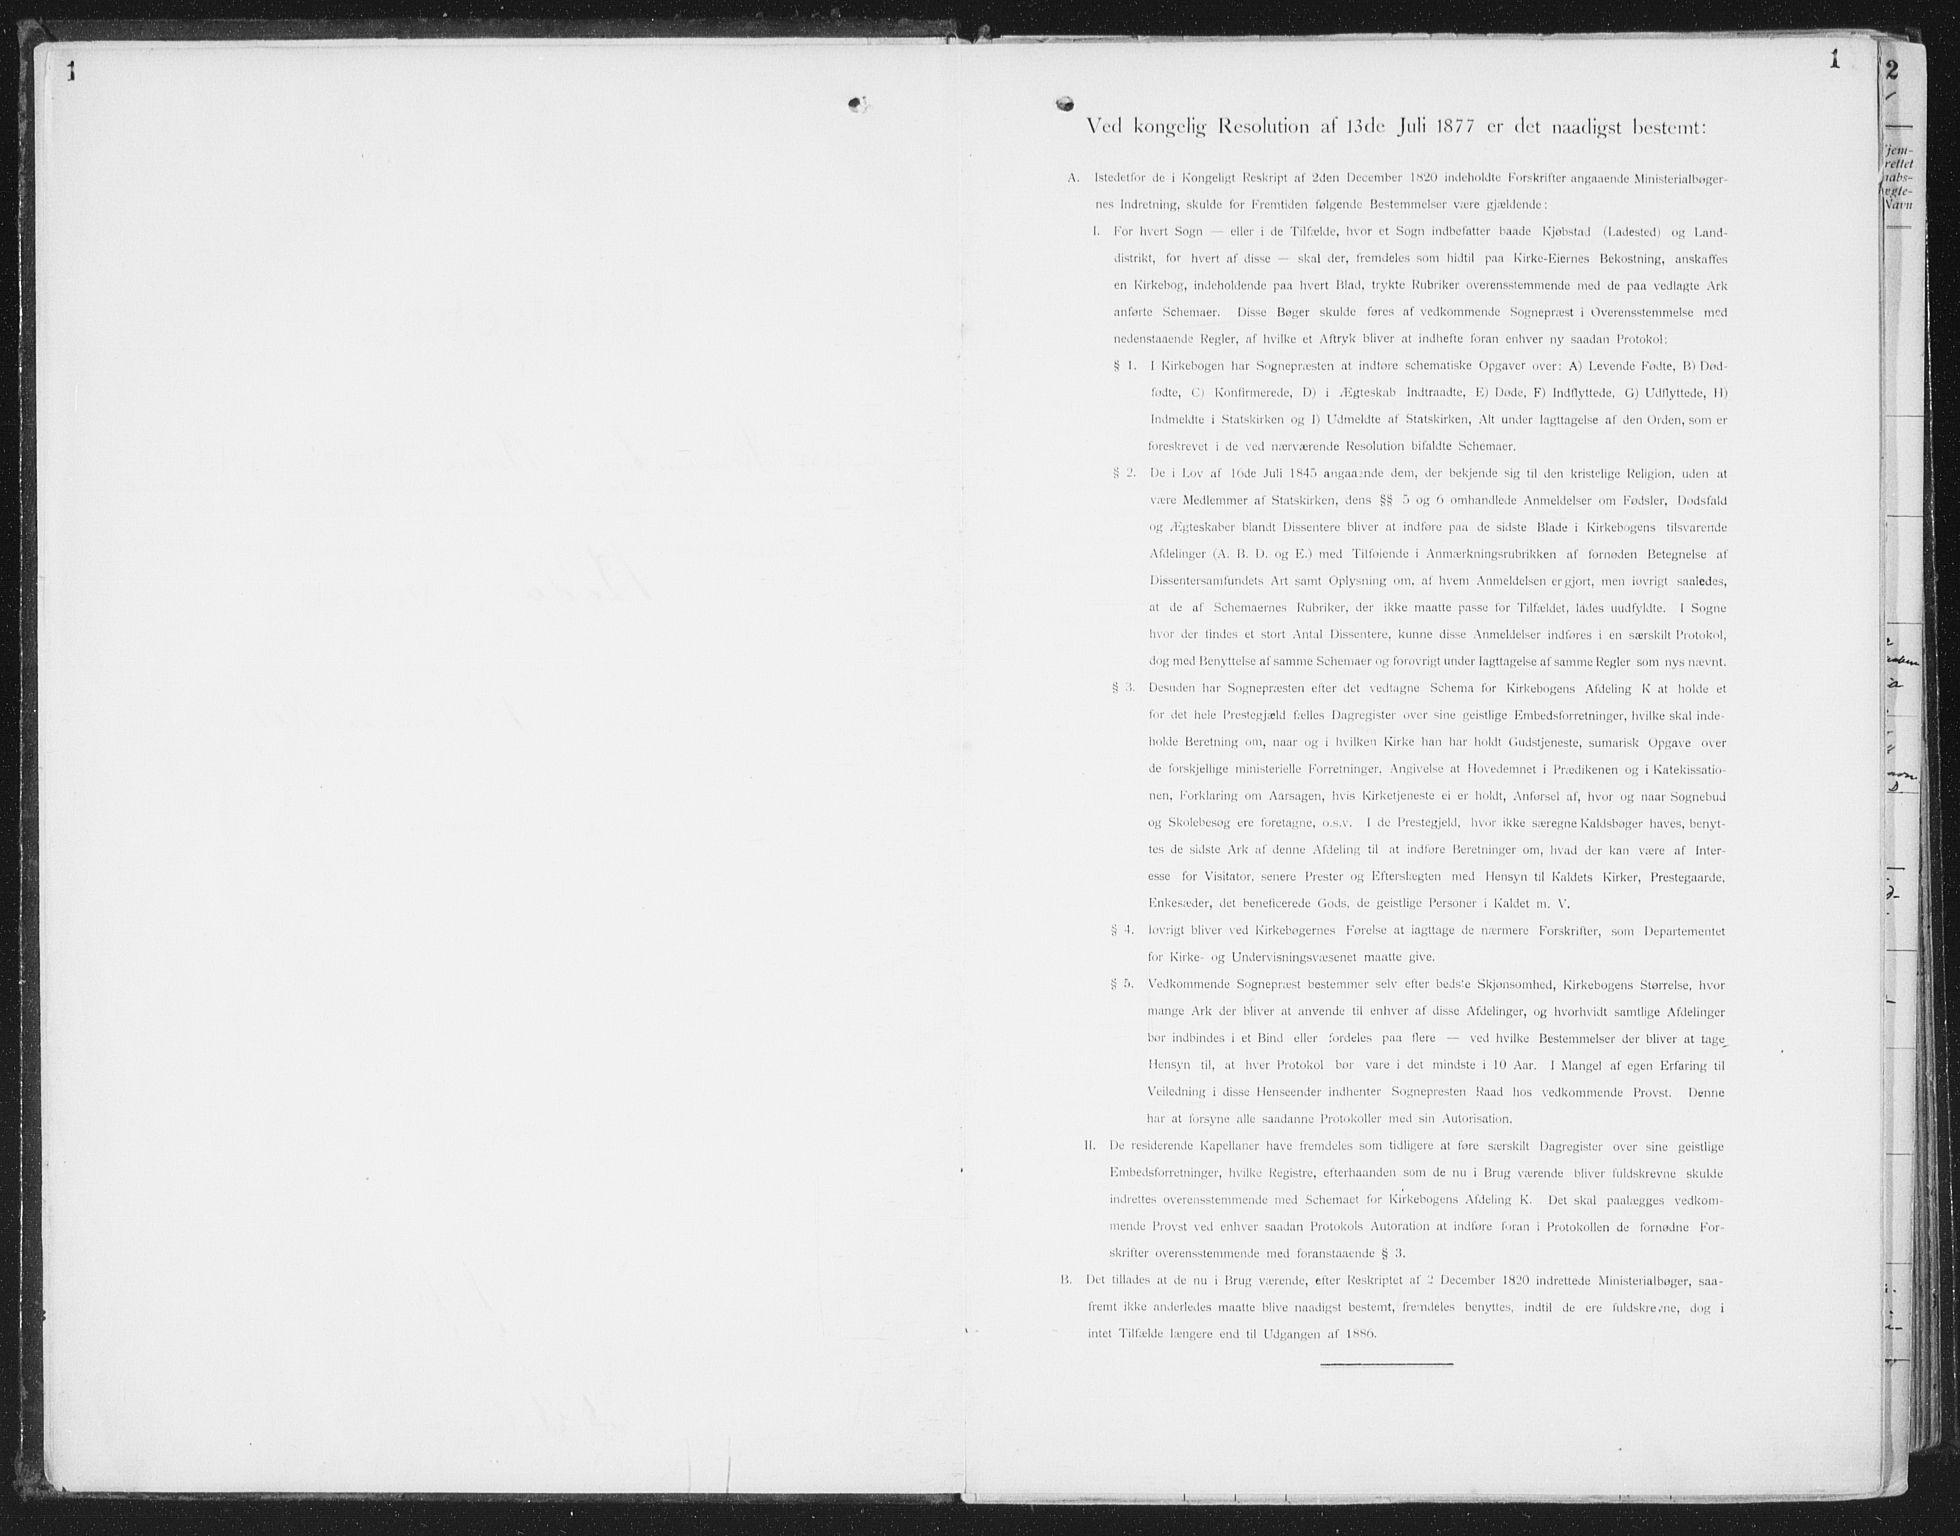 SAT, Ministerialprotokoller, klokkerbøker og fødselsregistre - Nordland, 804/L0081: Ministerialbok nr. 804A02, 1901-1915, s. 1